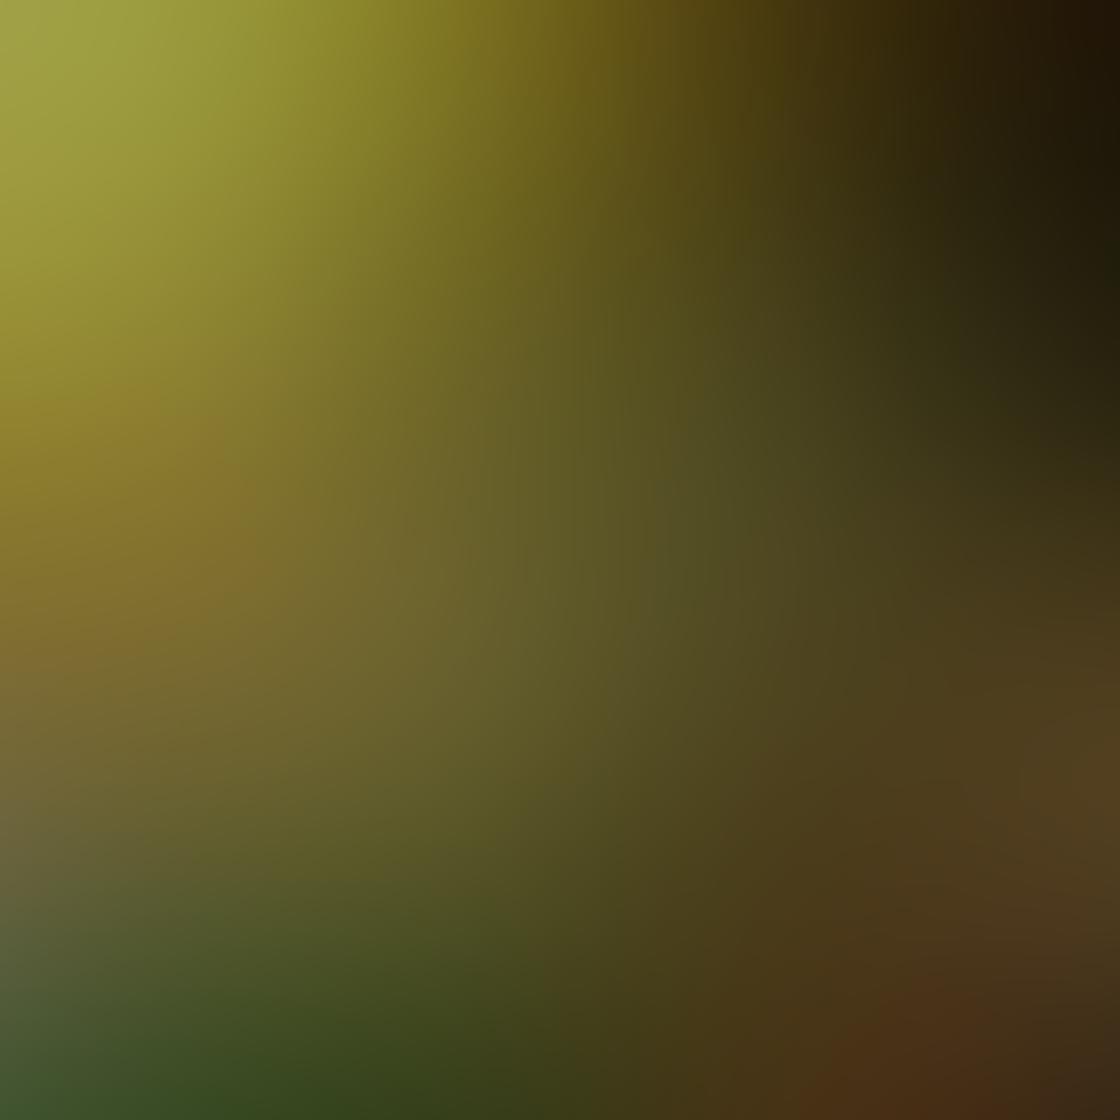 iPhone Photos Low Angle 9